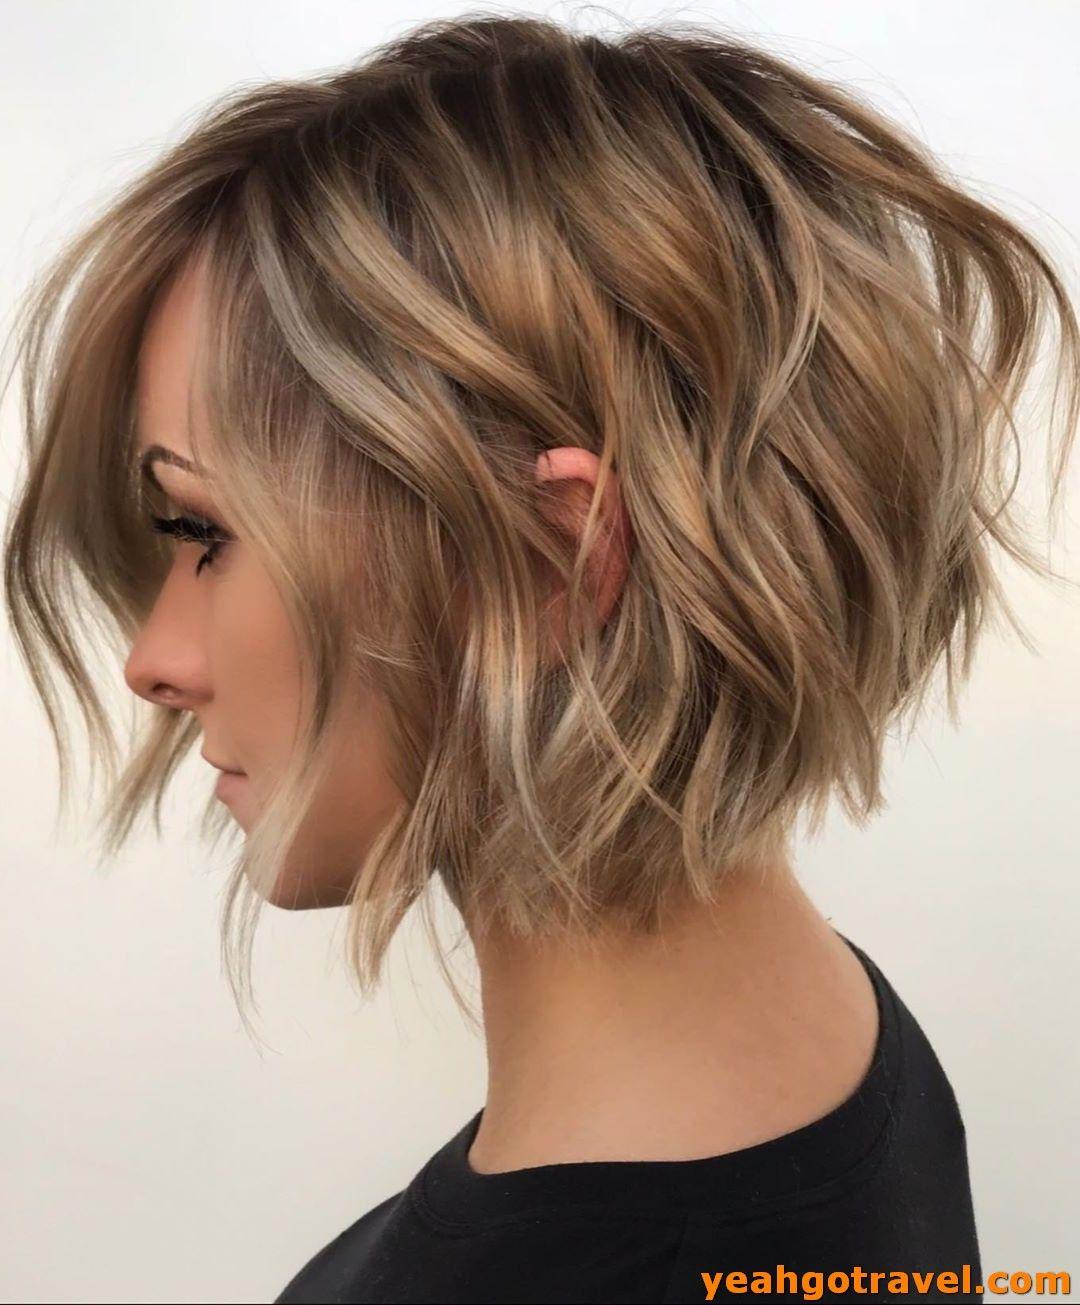 42 Cool Summer Hairstyles For Women 2019 Yeahgotravel Com Short Hair Haircuts Thick Hair Styles Bobs For Thin Hair